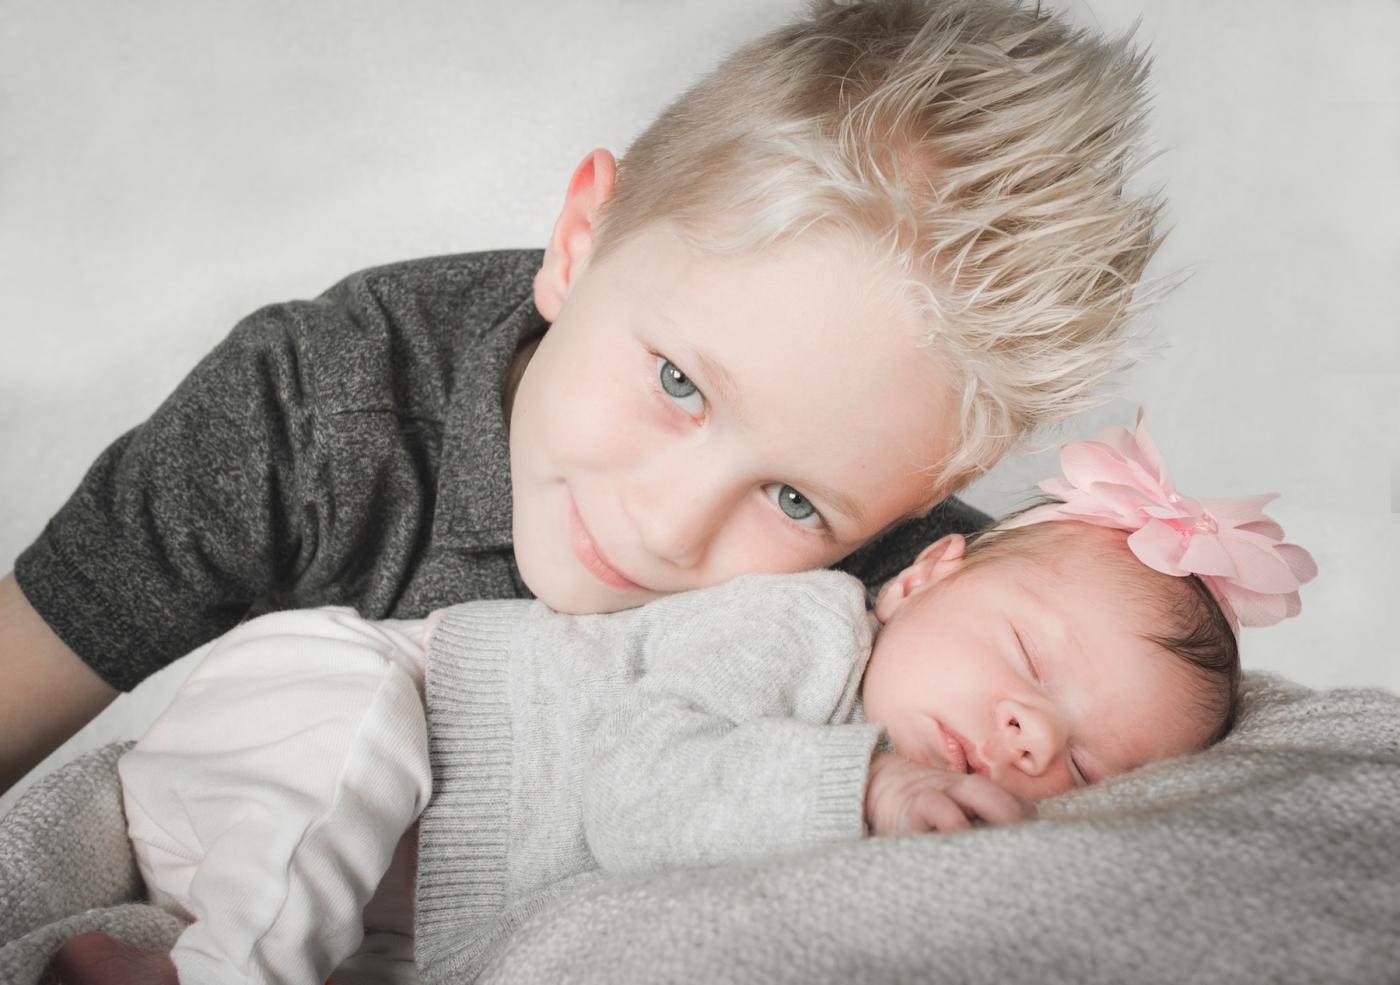 janes_photography_2016_renton_newborn_session_violetr8320